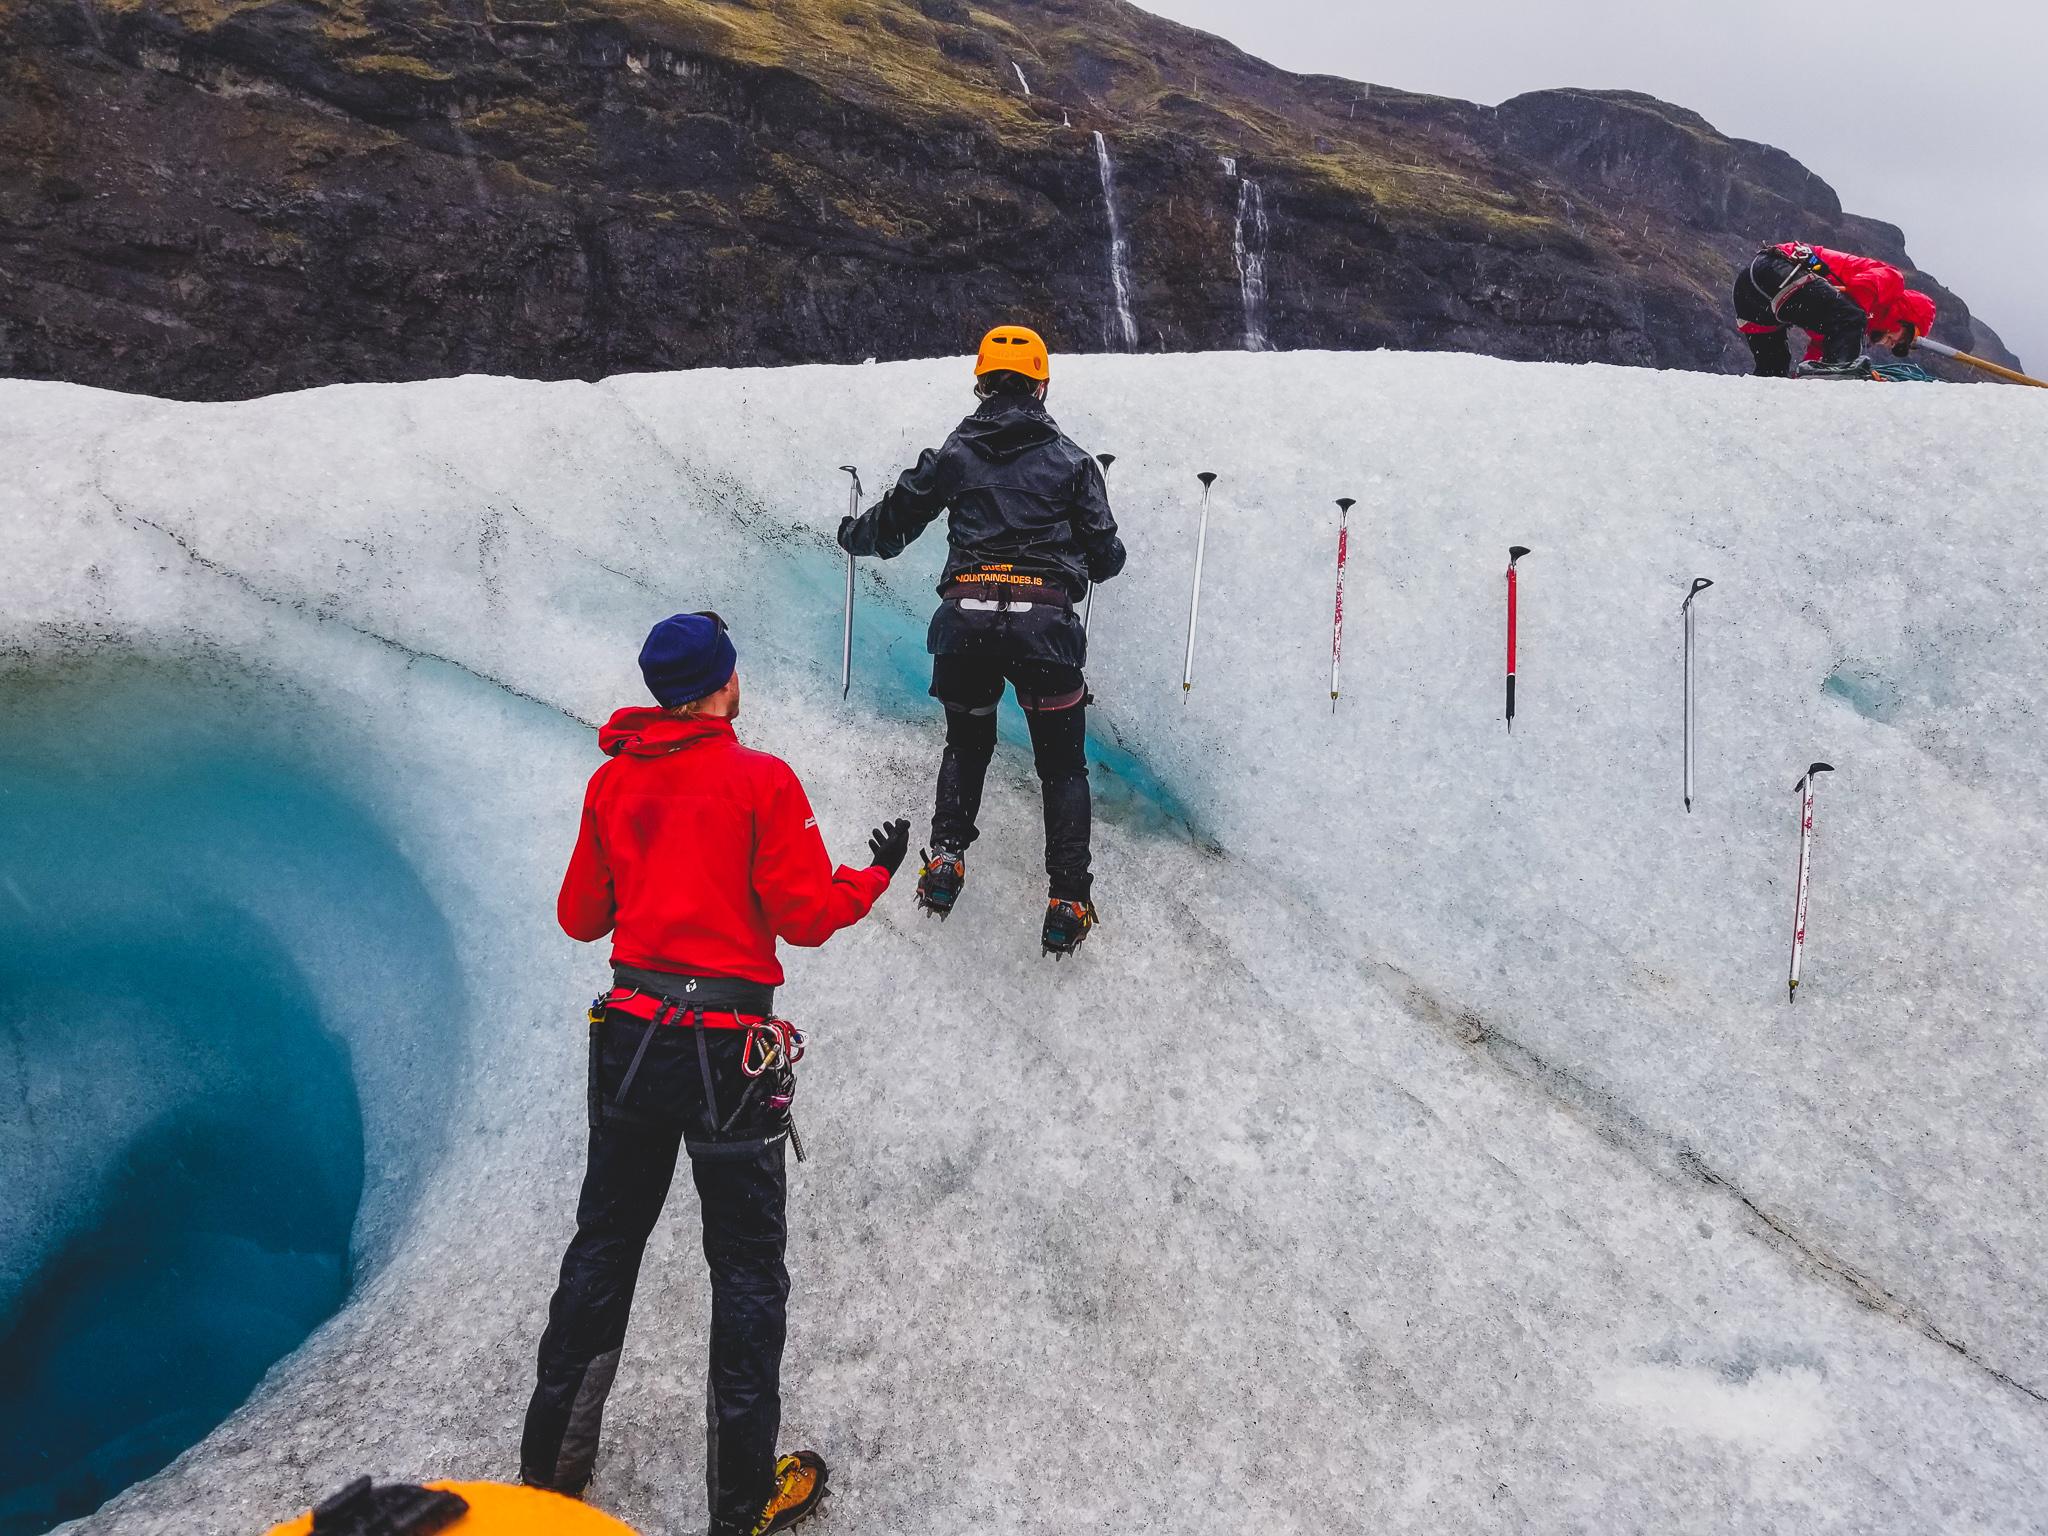 Ice climb practice